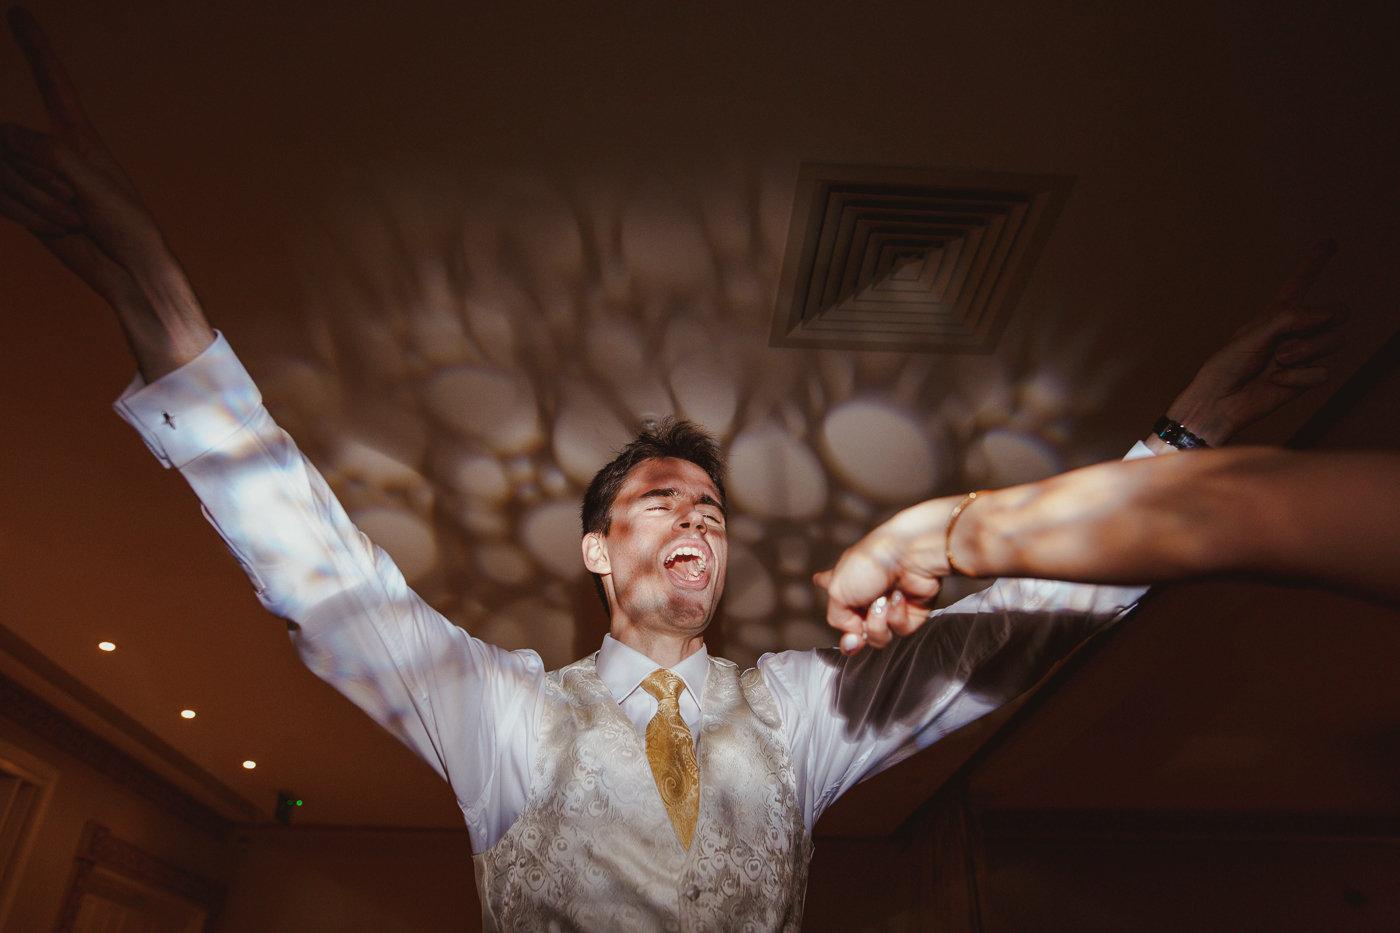 froyle-park-wedding-photography-51.jpg